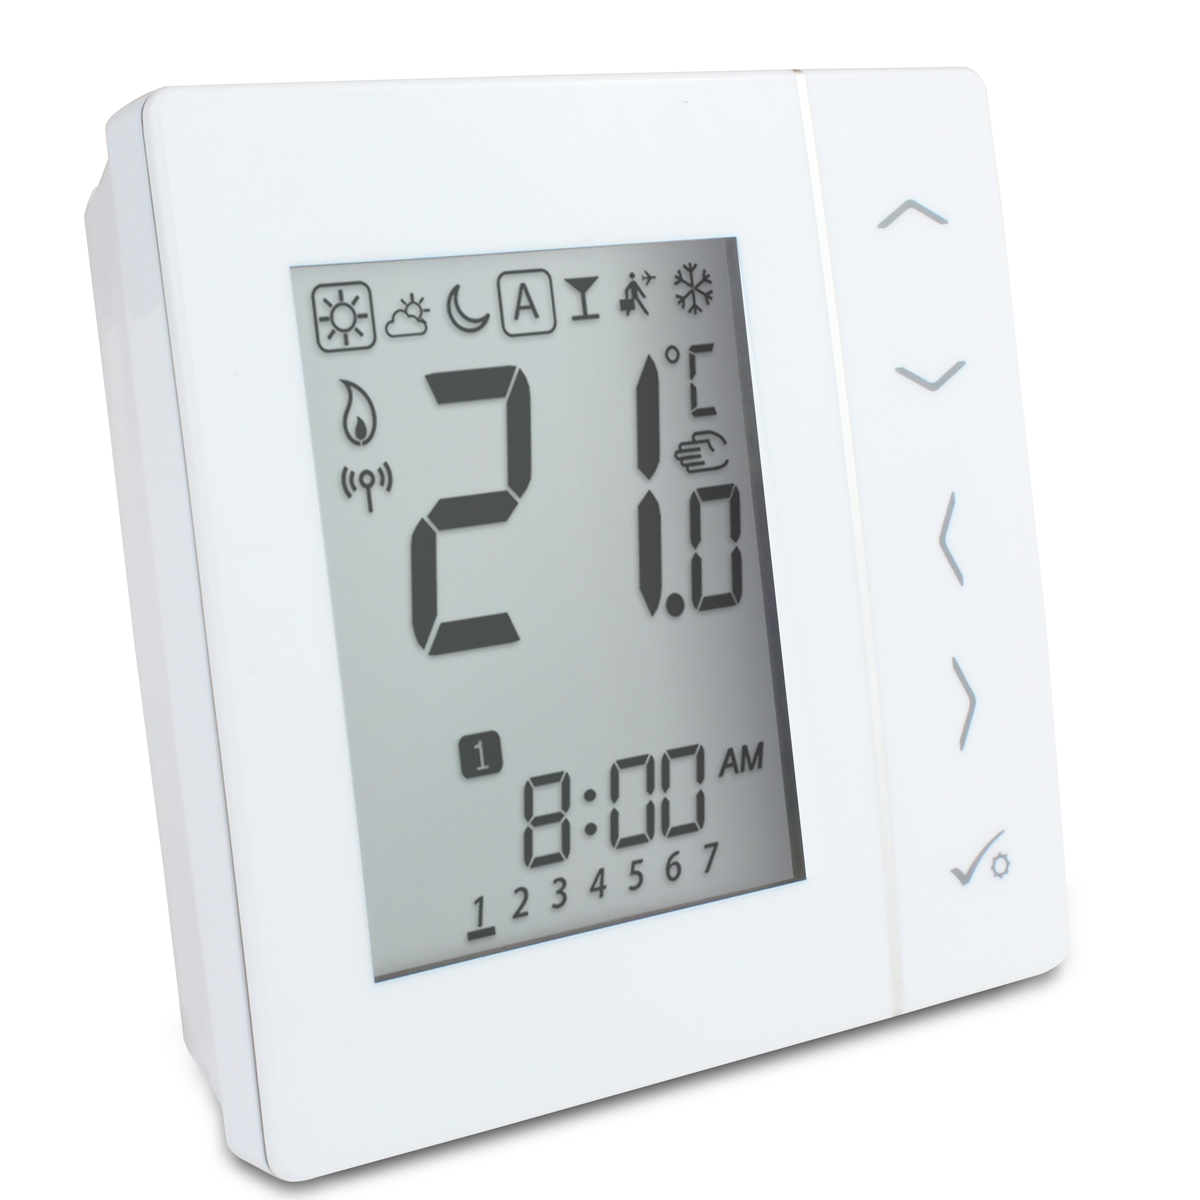 salus 4 in 1 digitales thermostat funk salus vs20wrf batteriebetrieben g nstig kaufen. Black Bedroom Furniture Sets. Home Design Ideas